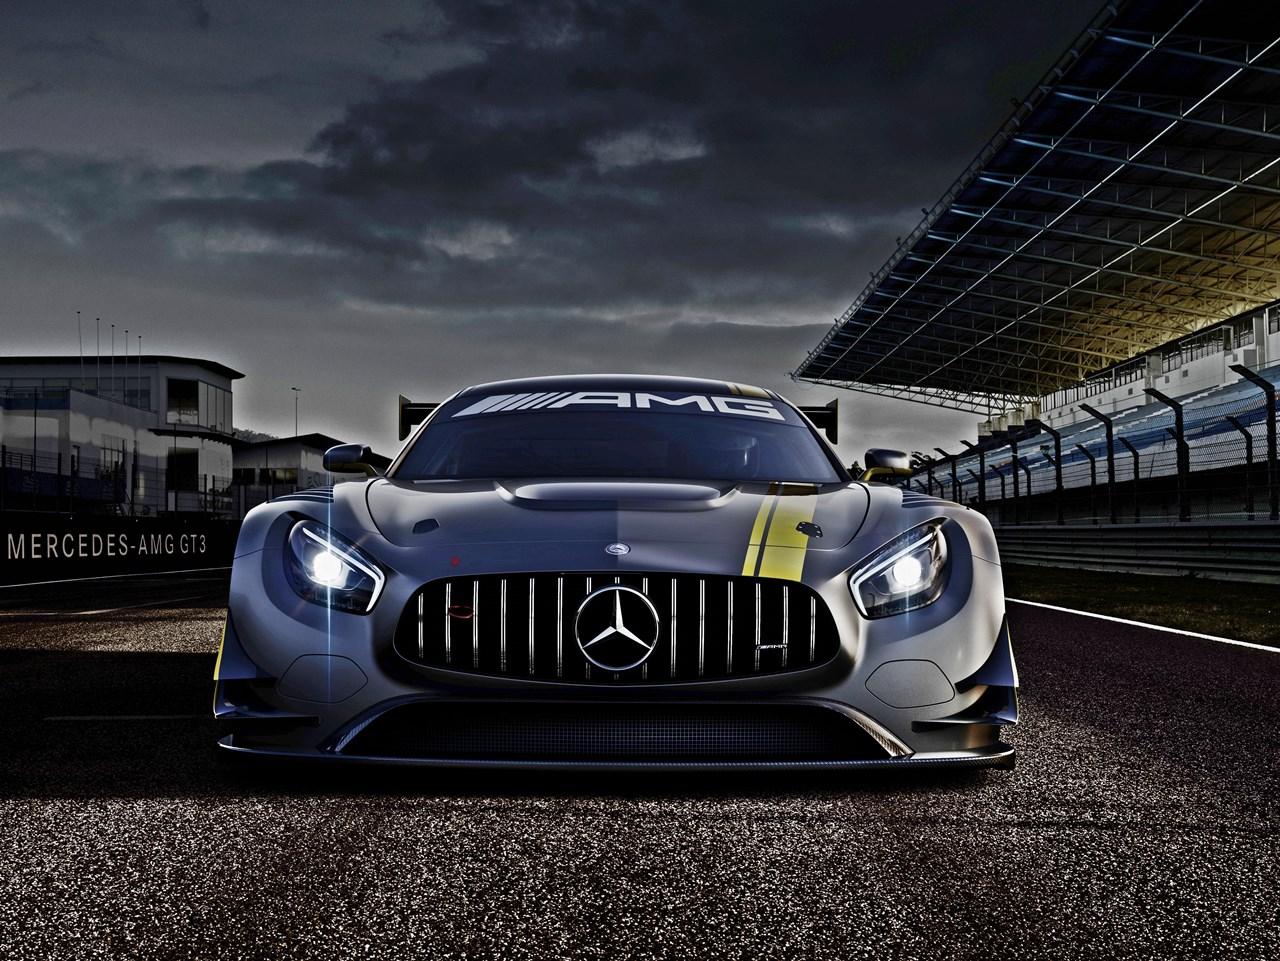 Teaser-Bild: Mercedes-AMG GT3